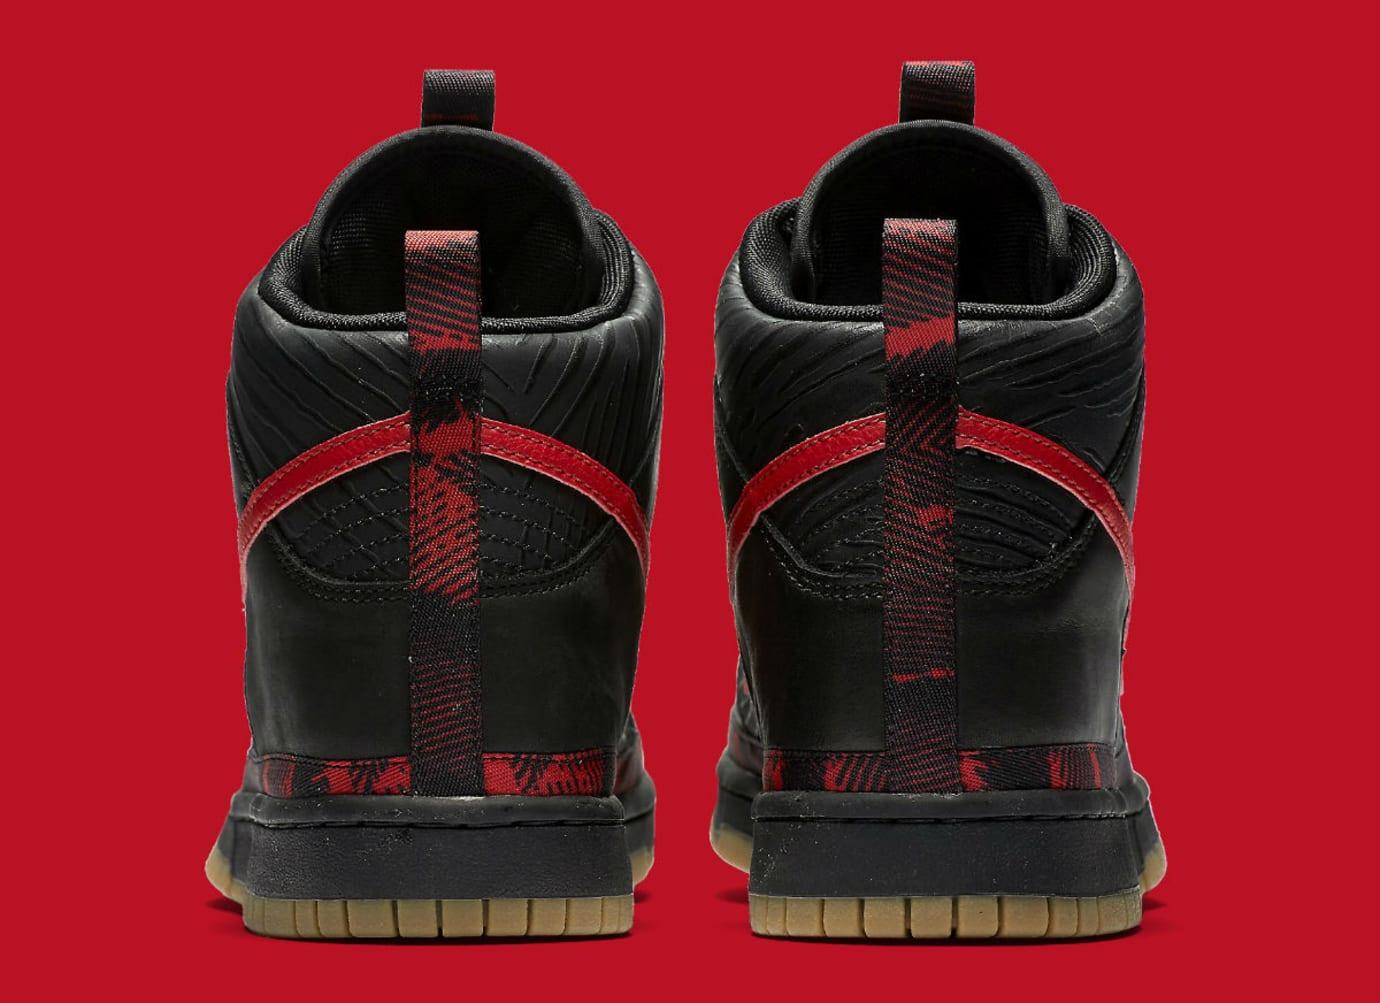 Nike N7 Dunk High Black Red Release Date Heel AA1126-001